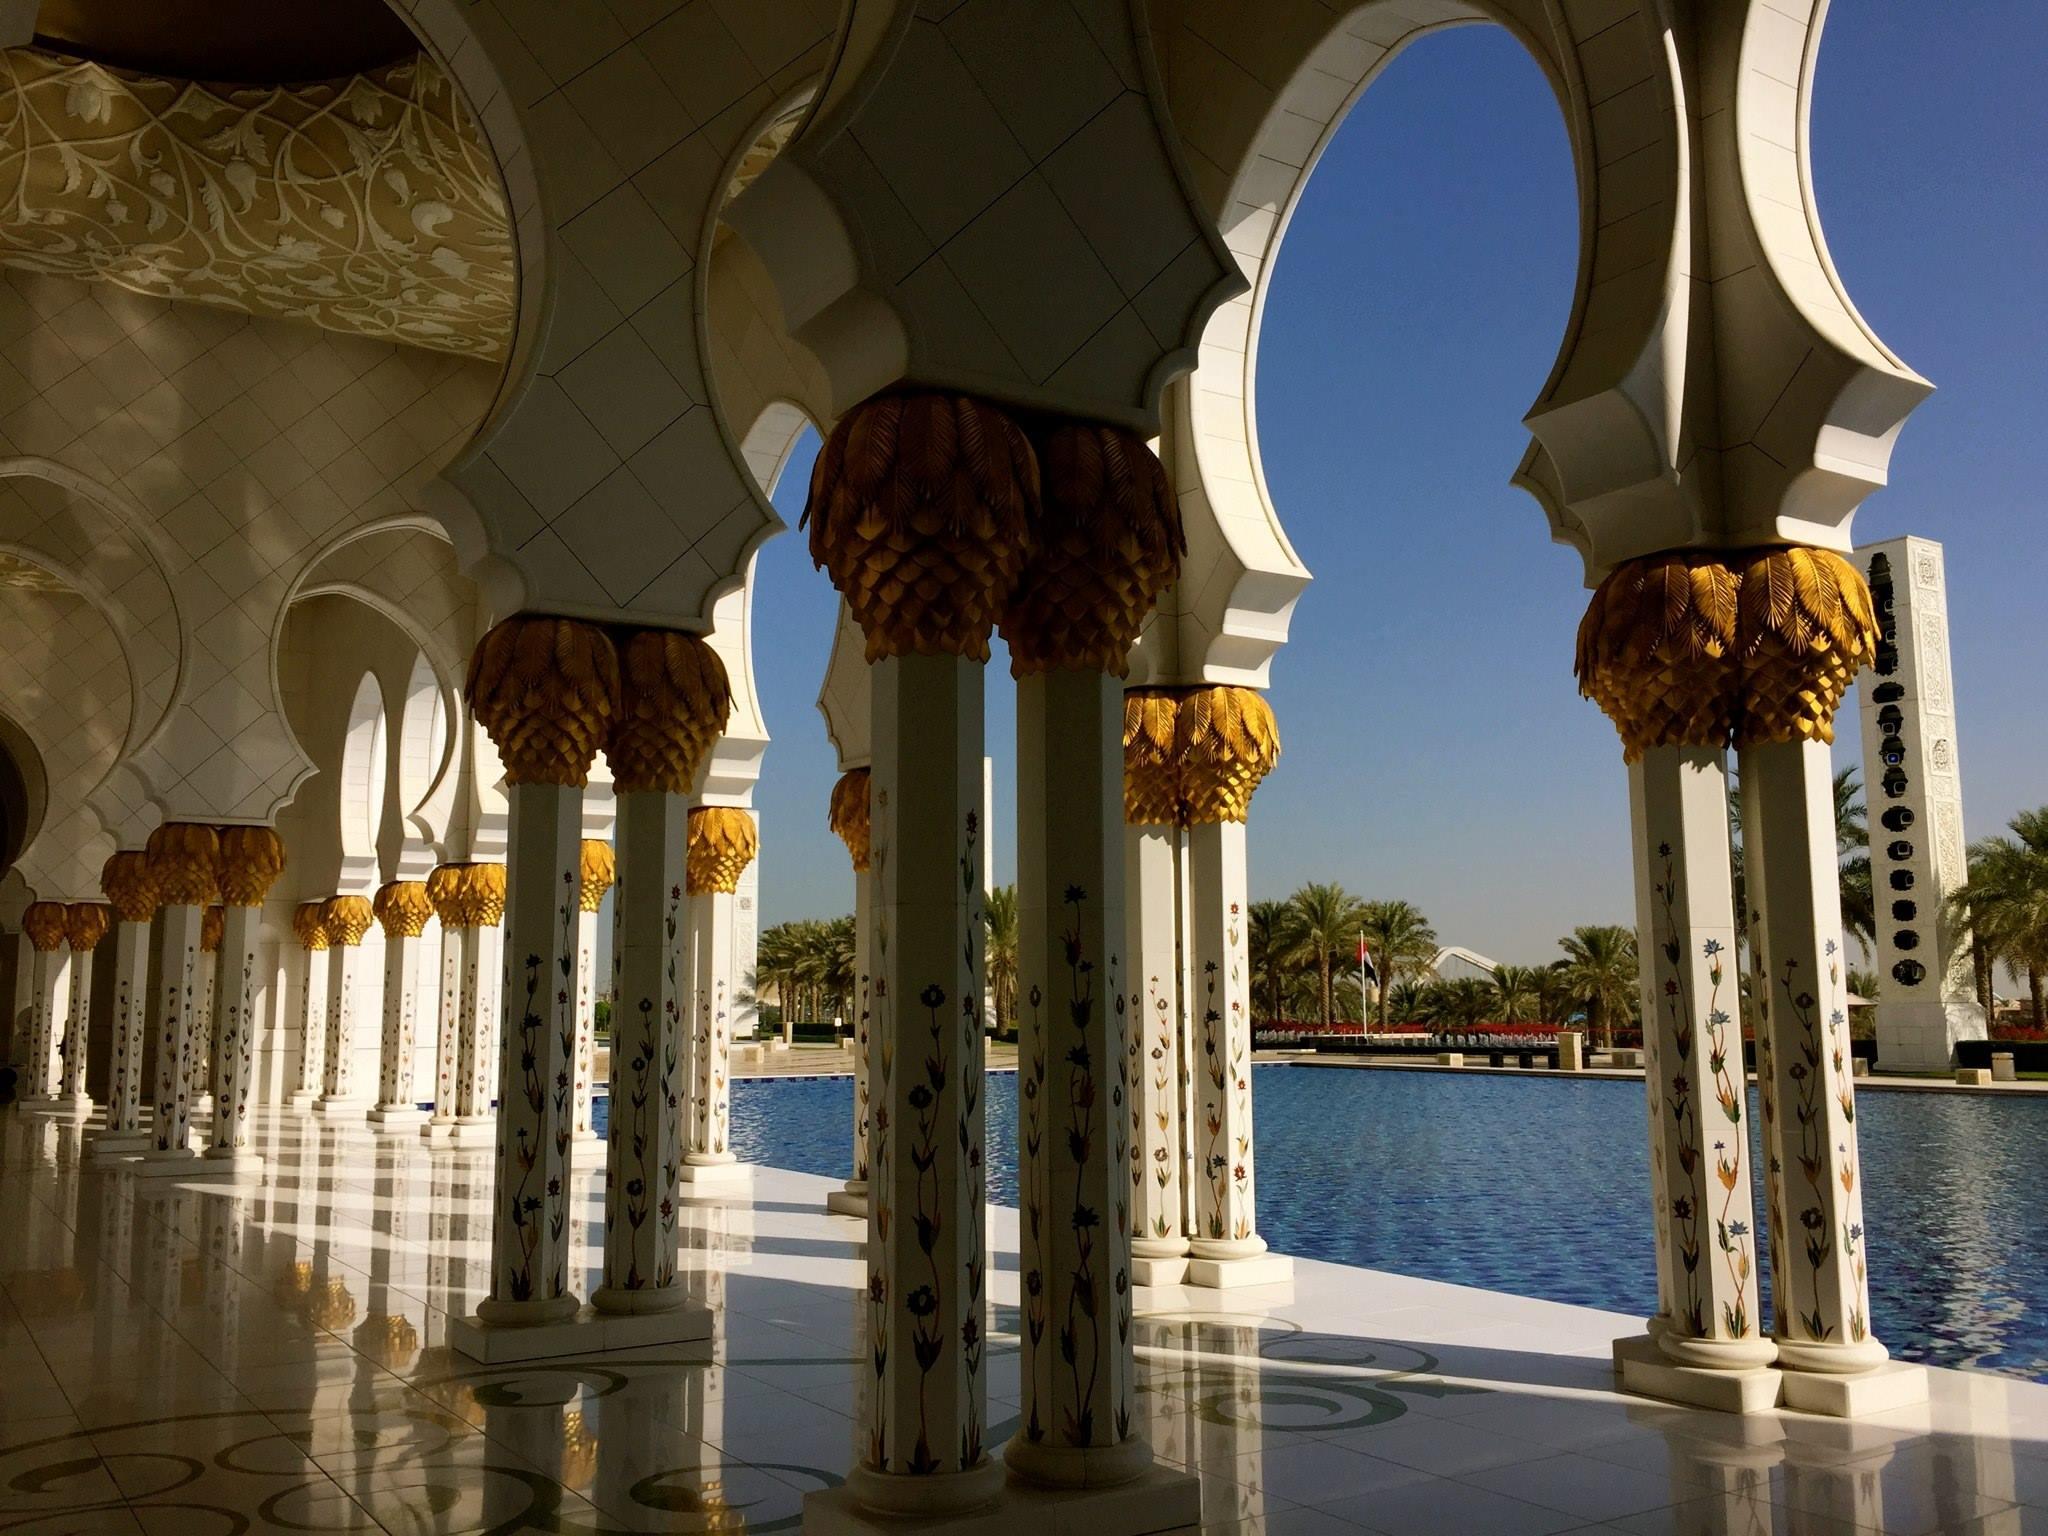 Sheikh Zayed Mosque in Abu Dhabi, Photo by Bernd Slotta